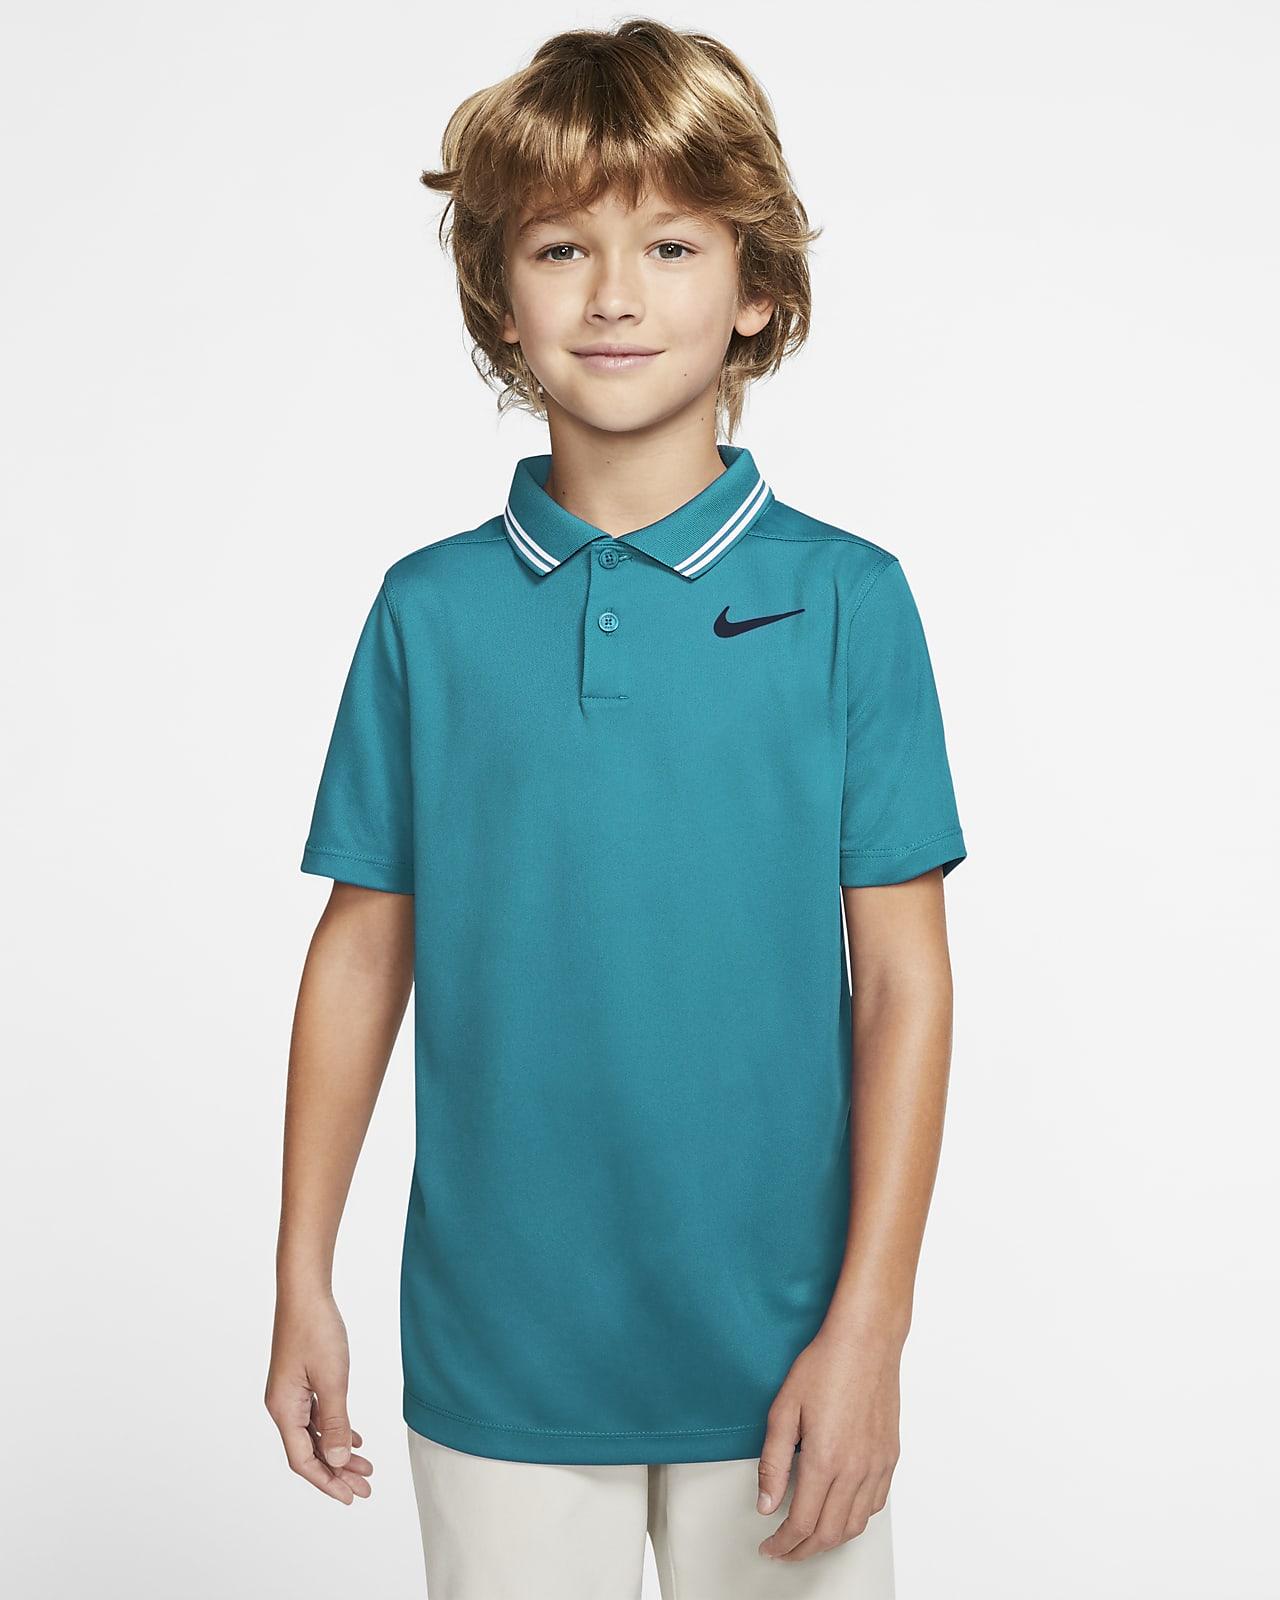 Nike Dri-FIT Victory Boys' Golf Polo